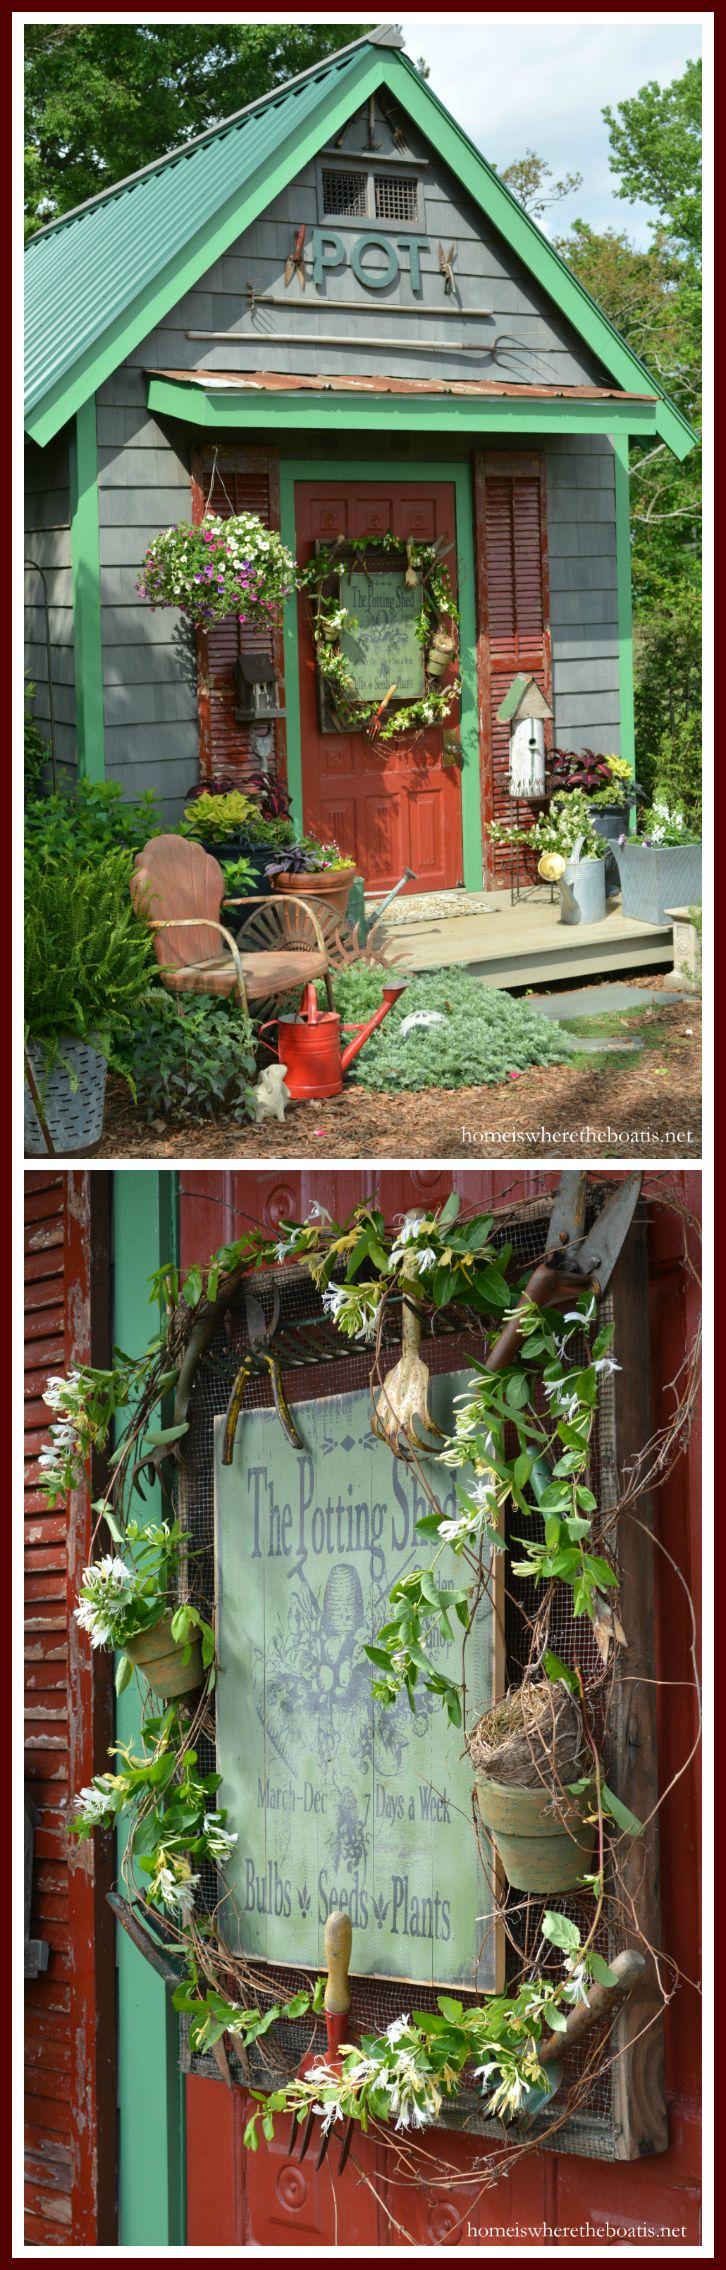 Potting Shed Door Sign! Hung On Hardware Cloth Frame With Vintage Garden  Tools, Pots